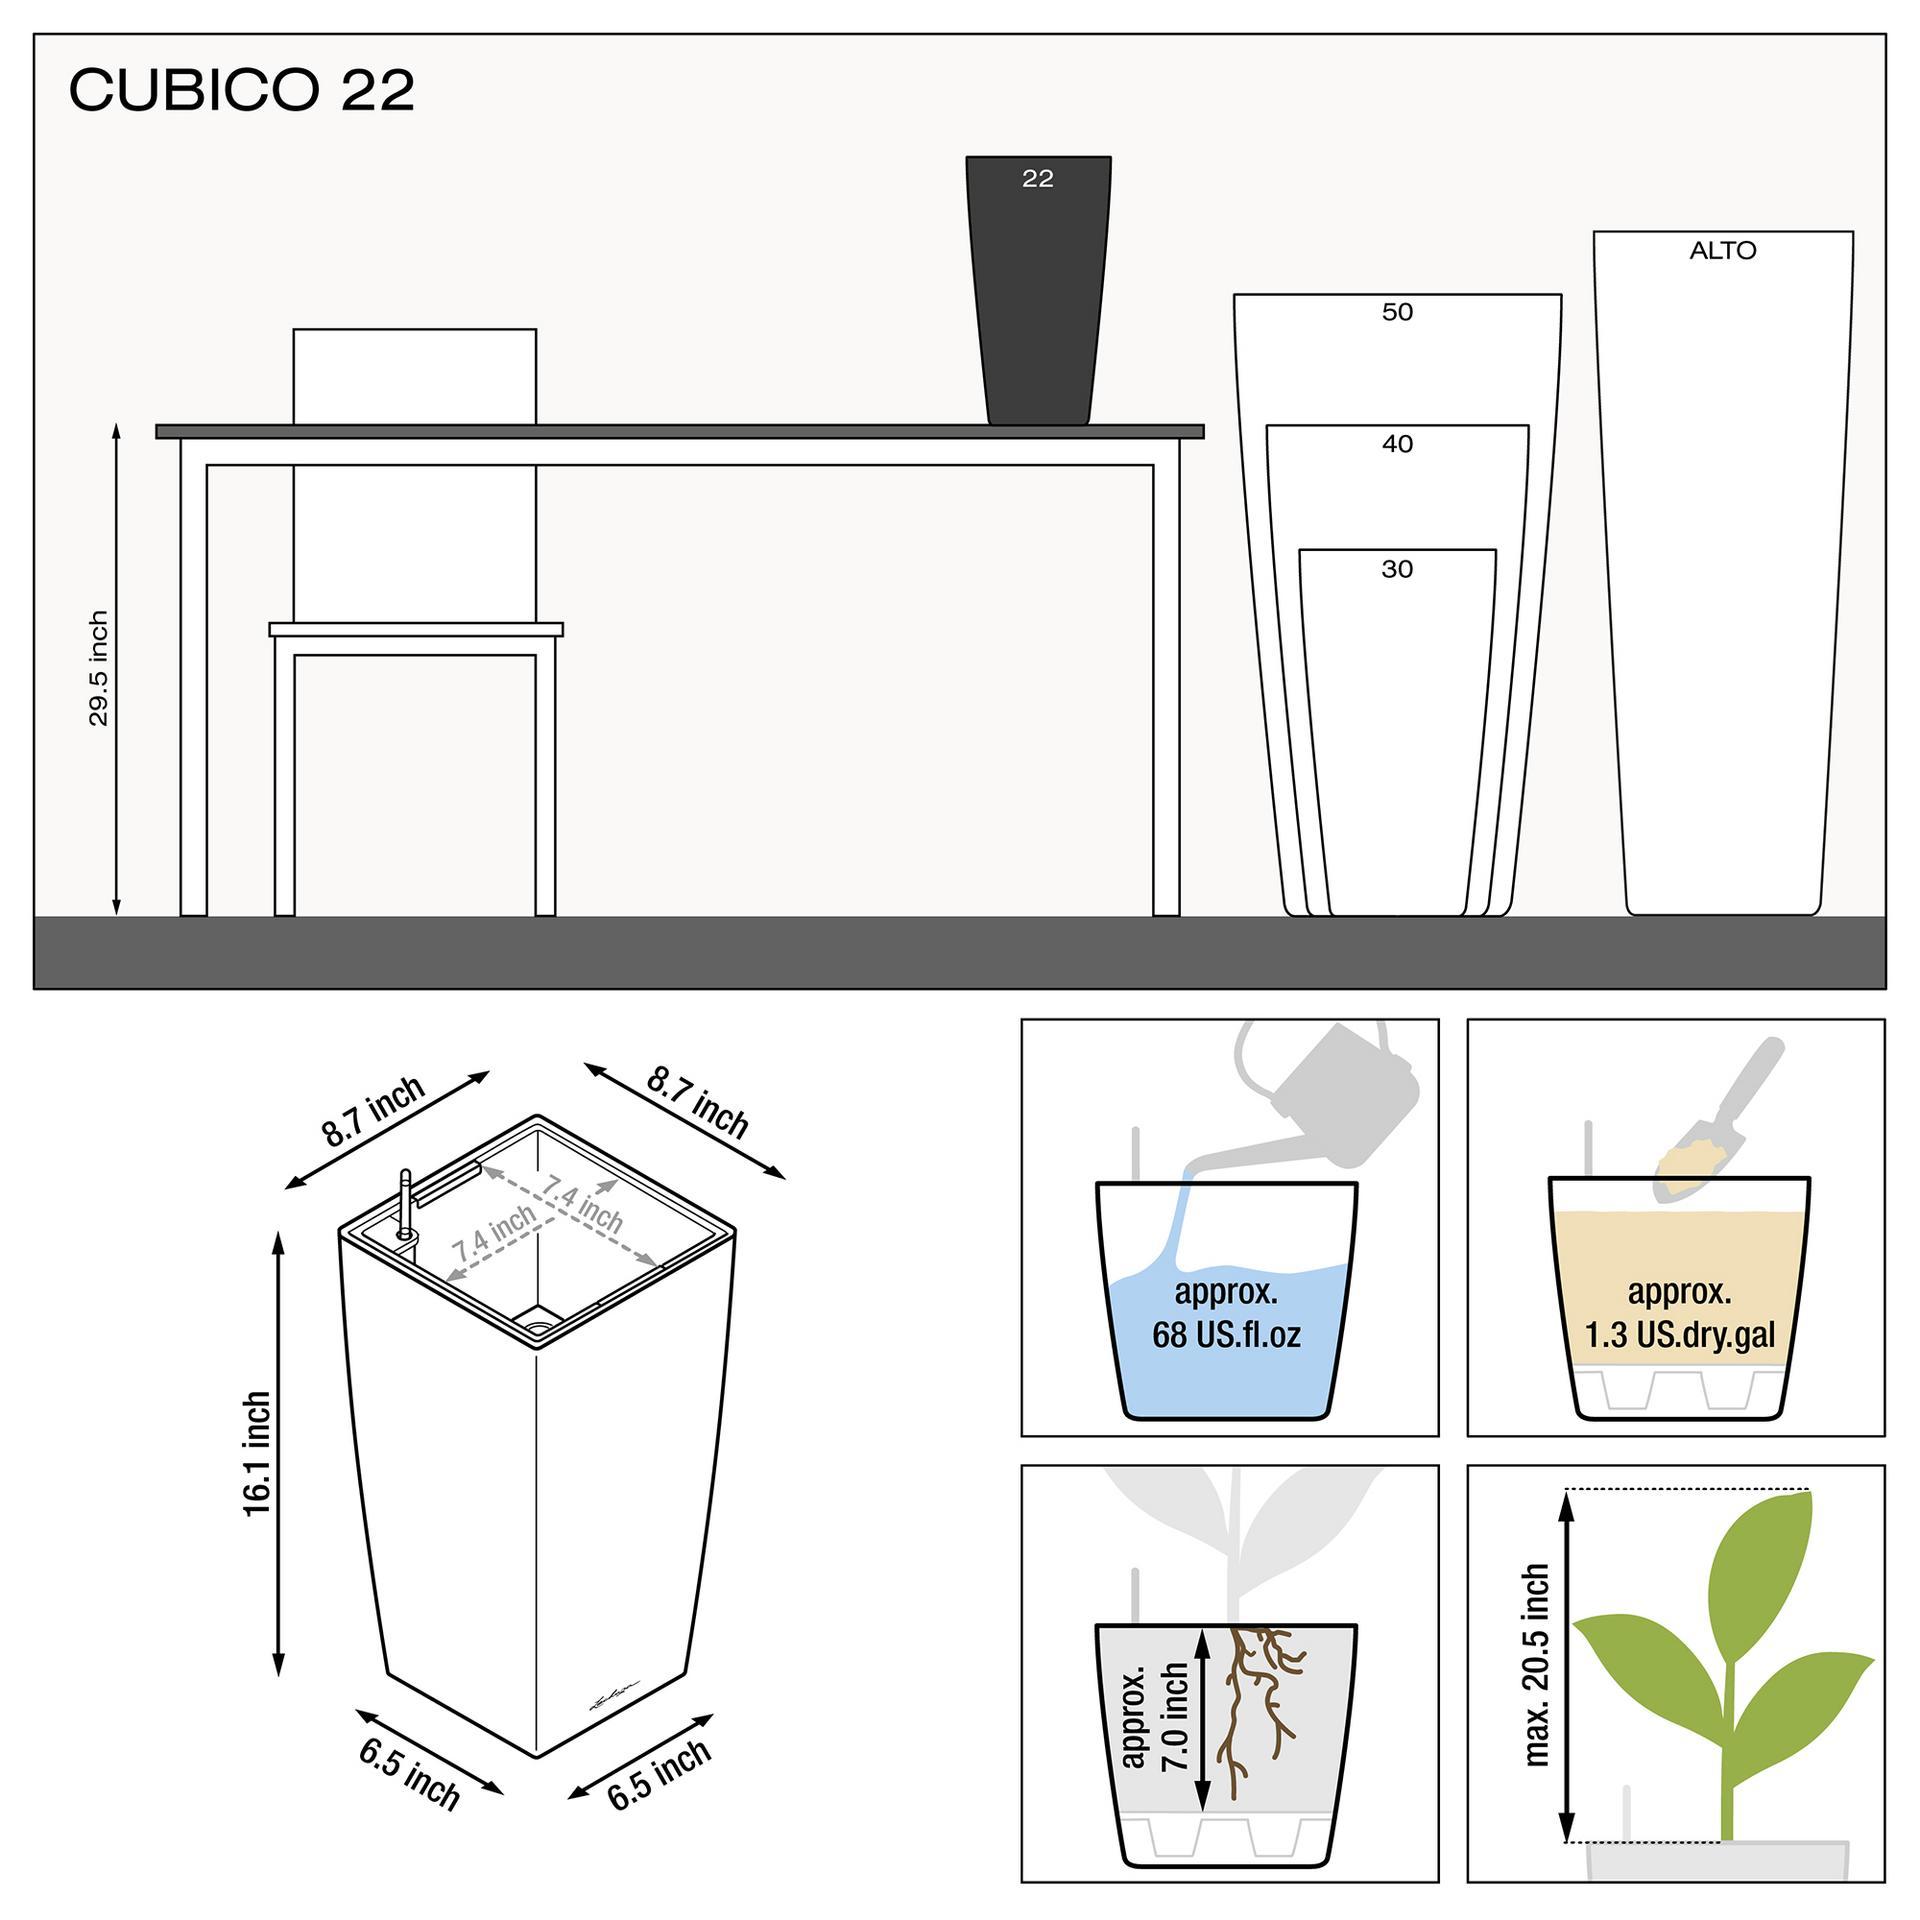 le_cubico22_product_addi_nz_us